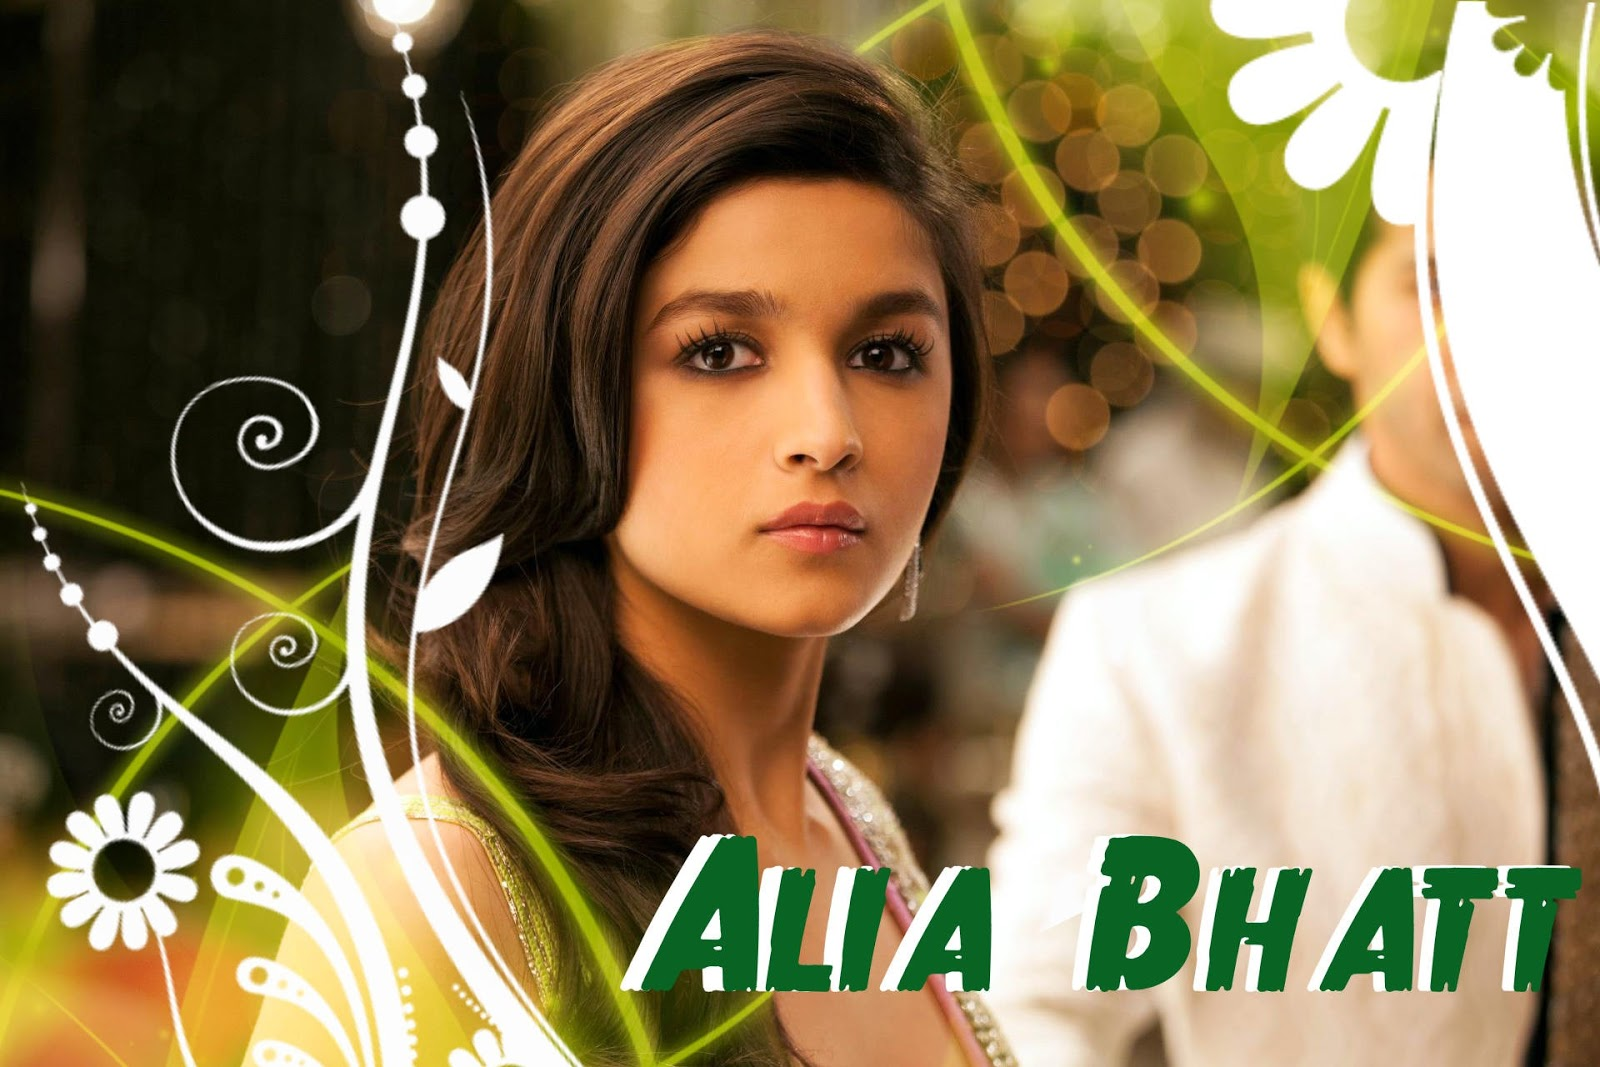 Wallpaper download bollywood actors - Bollywood Actress Alia Bhatt Hot Bollywood Actress Wallpaper Free